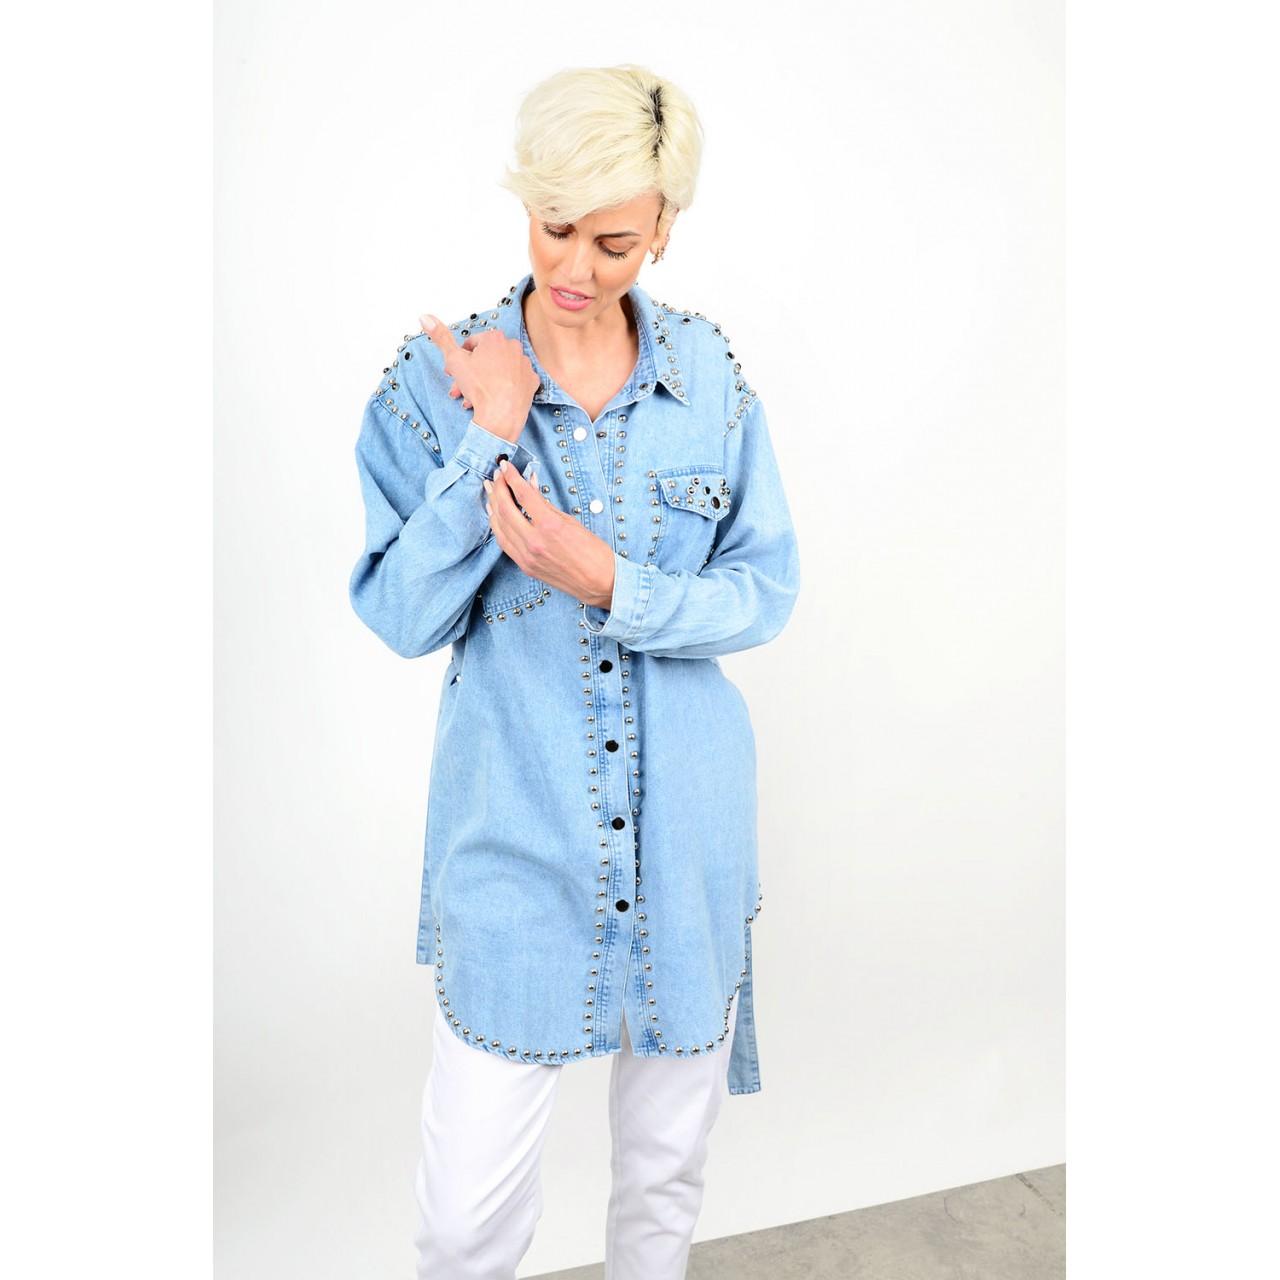 148.Oversized πουκαμίσα τζιν με τρούκς Limited Edition